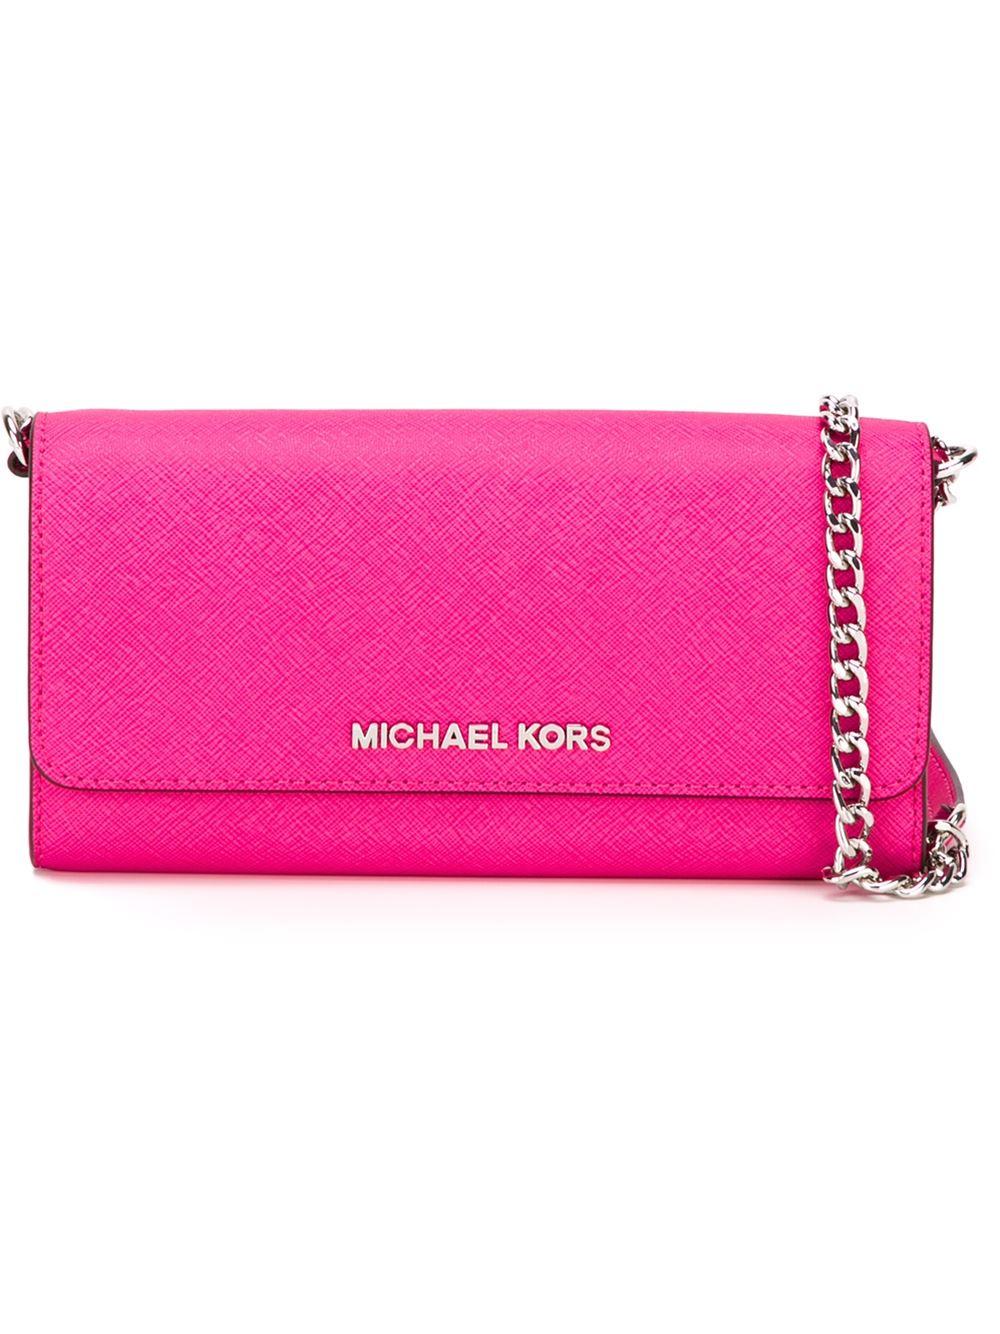 98d15e6e585d Michael michael kors Jet Set Travel Wallet Cross-Body Bag in Pink | Lyst